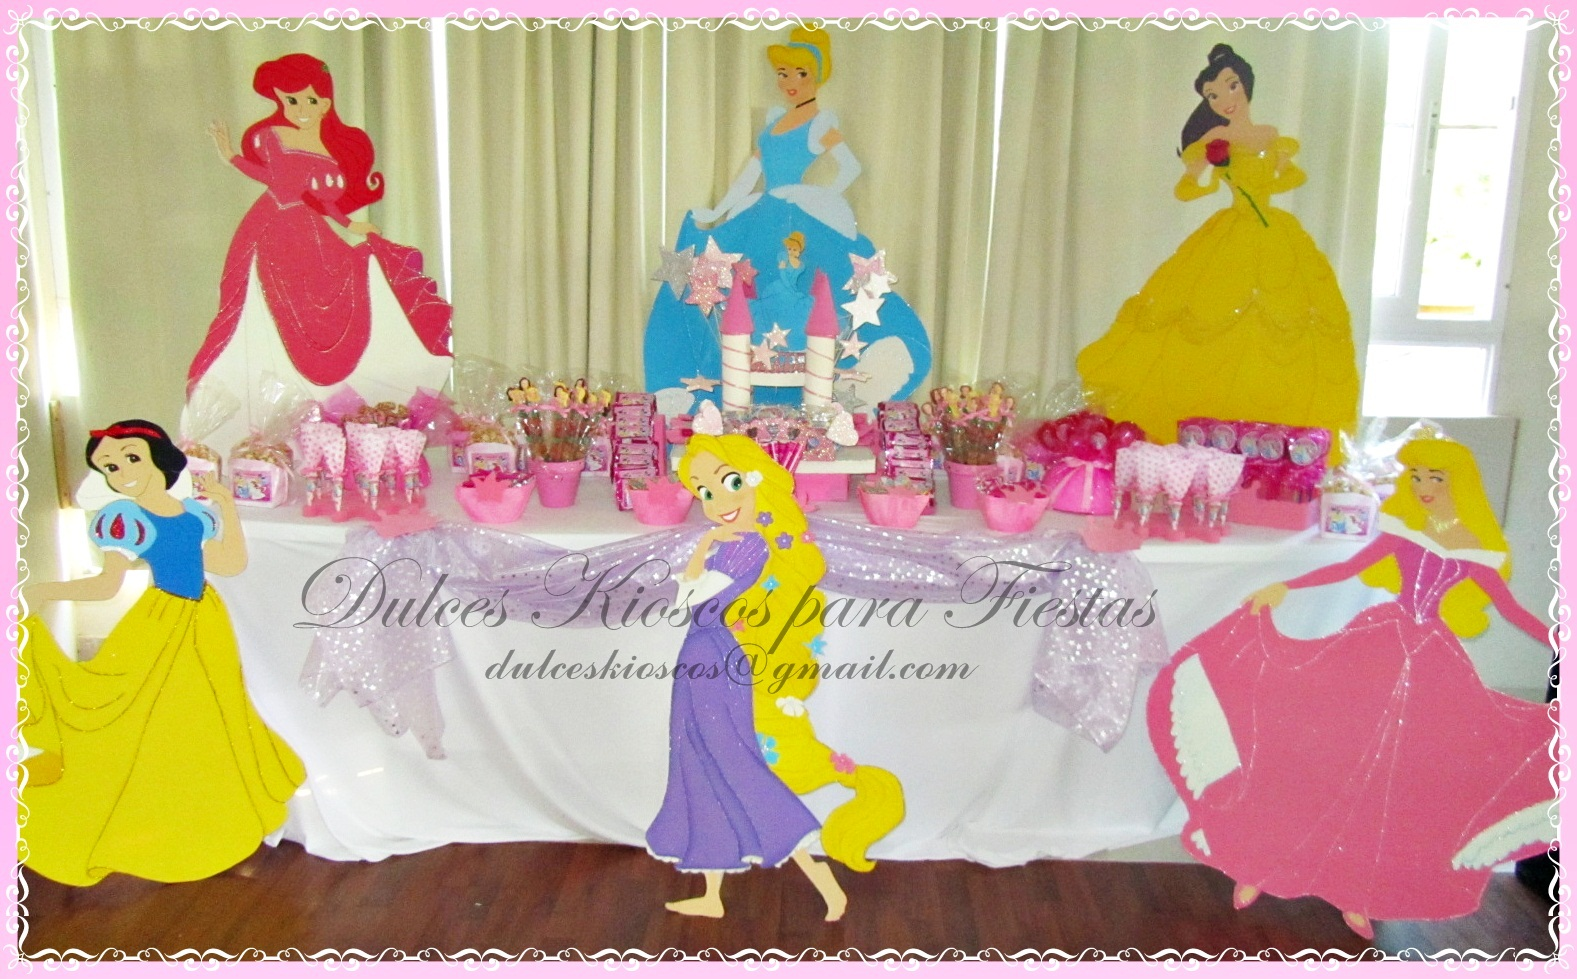 Dulces kioscos para fiestas cumplea os tematico - Fiestas de cumpleanos de princesas ...